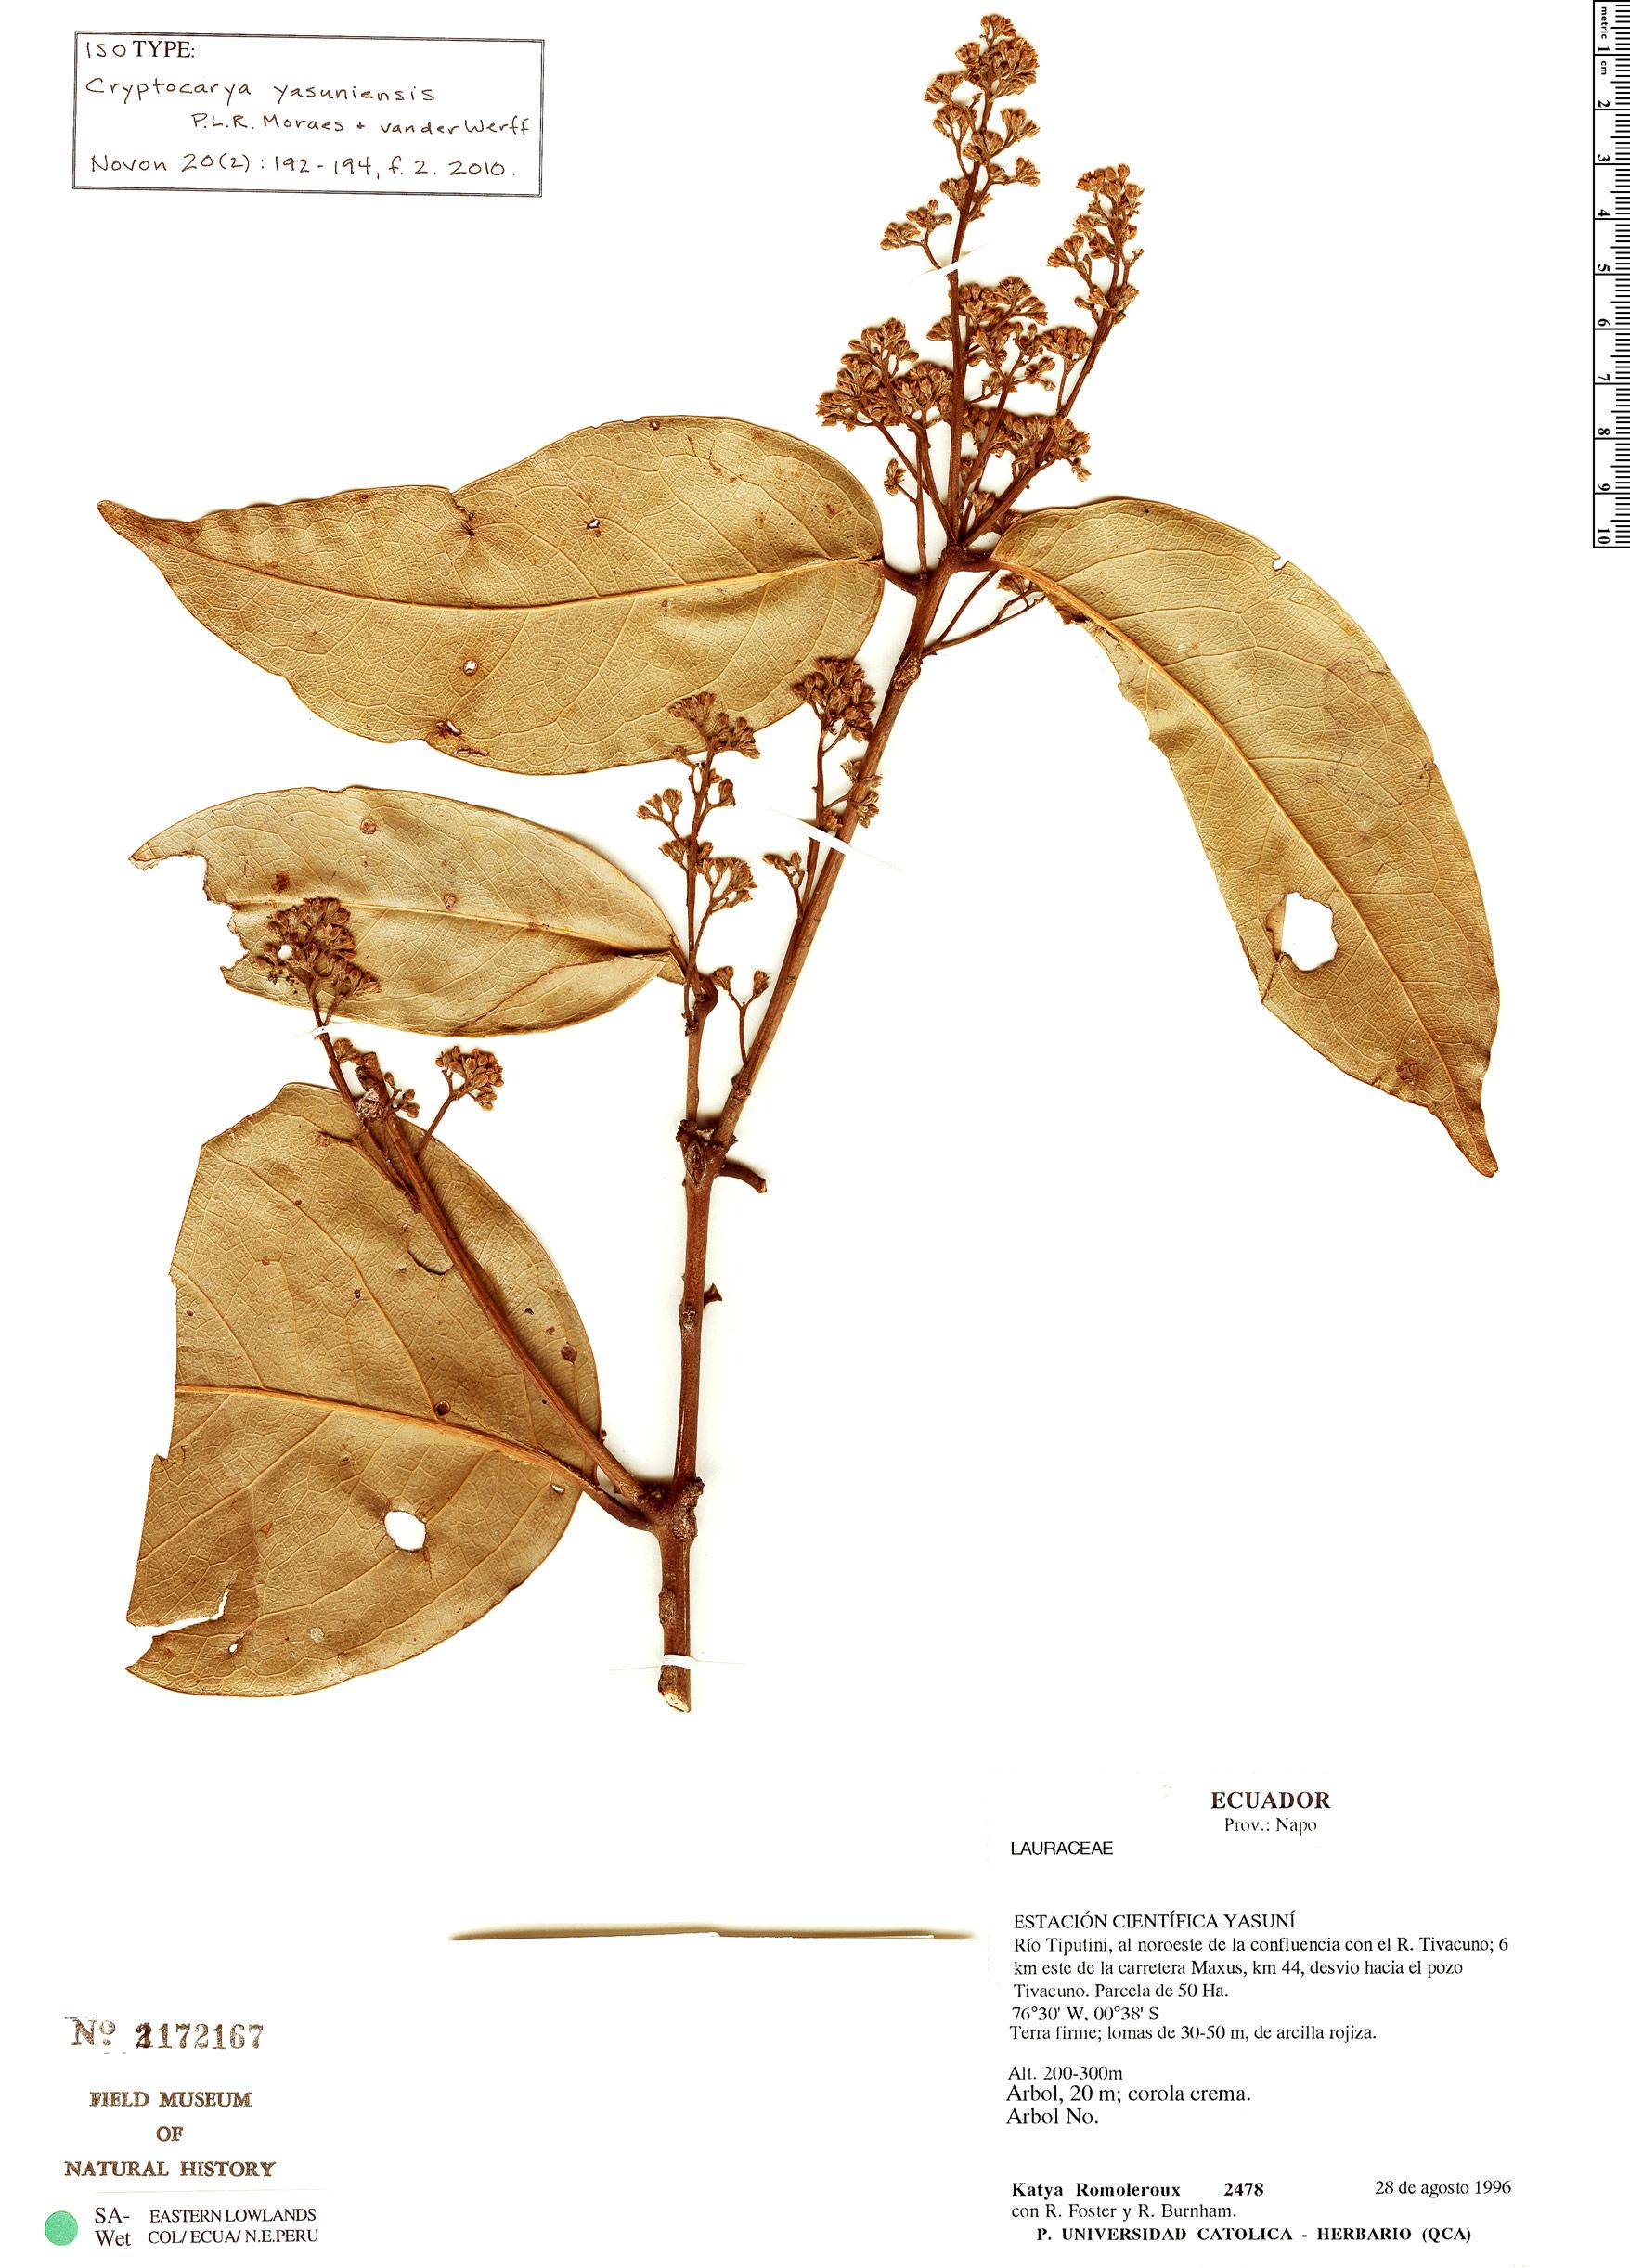 Espécime: Cryptocarya yasuniensis